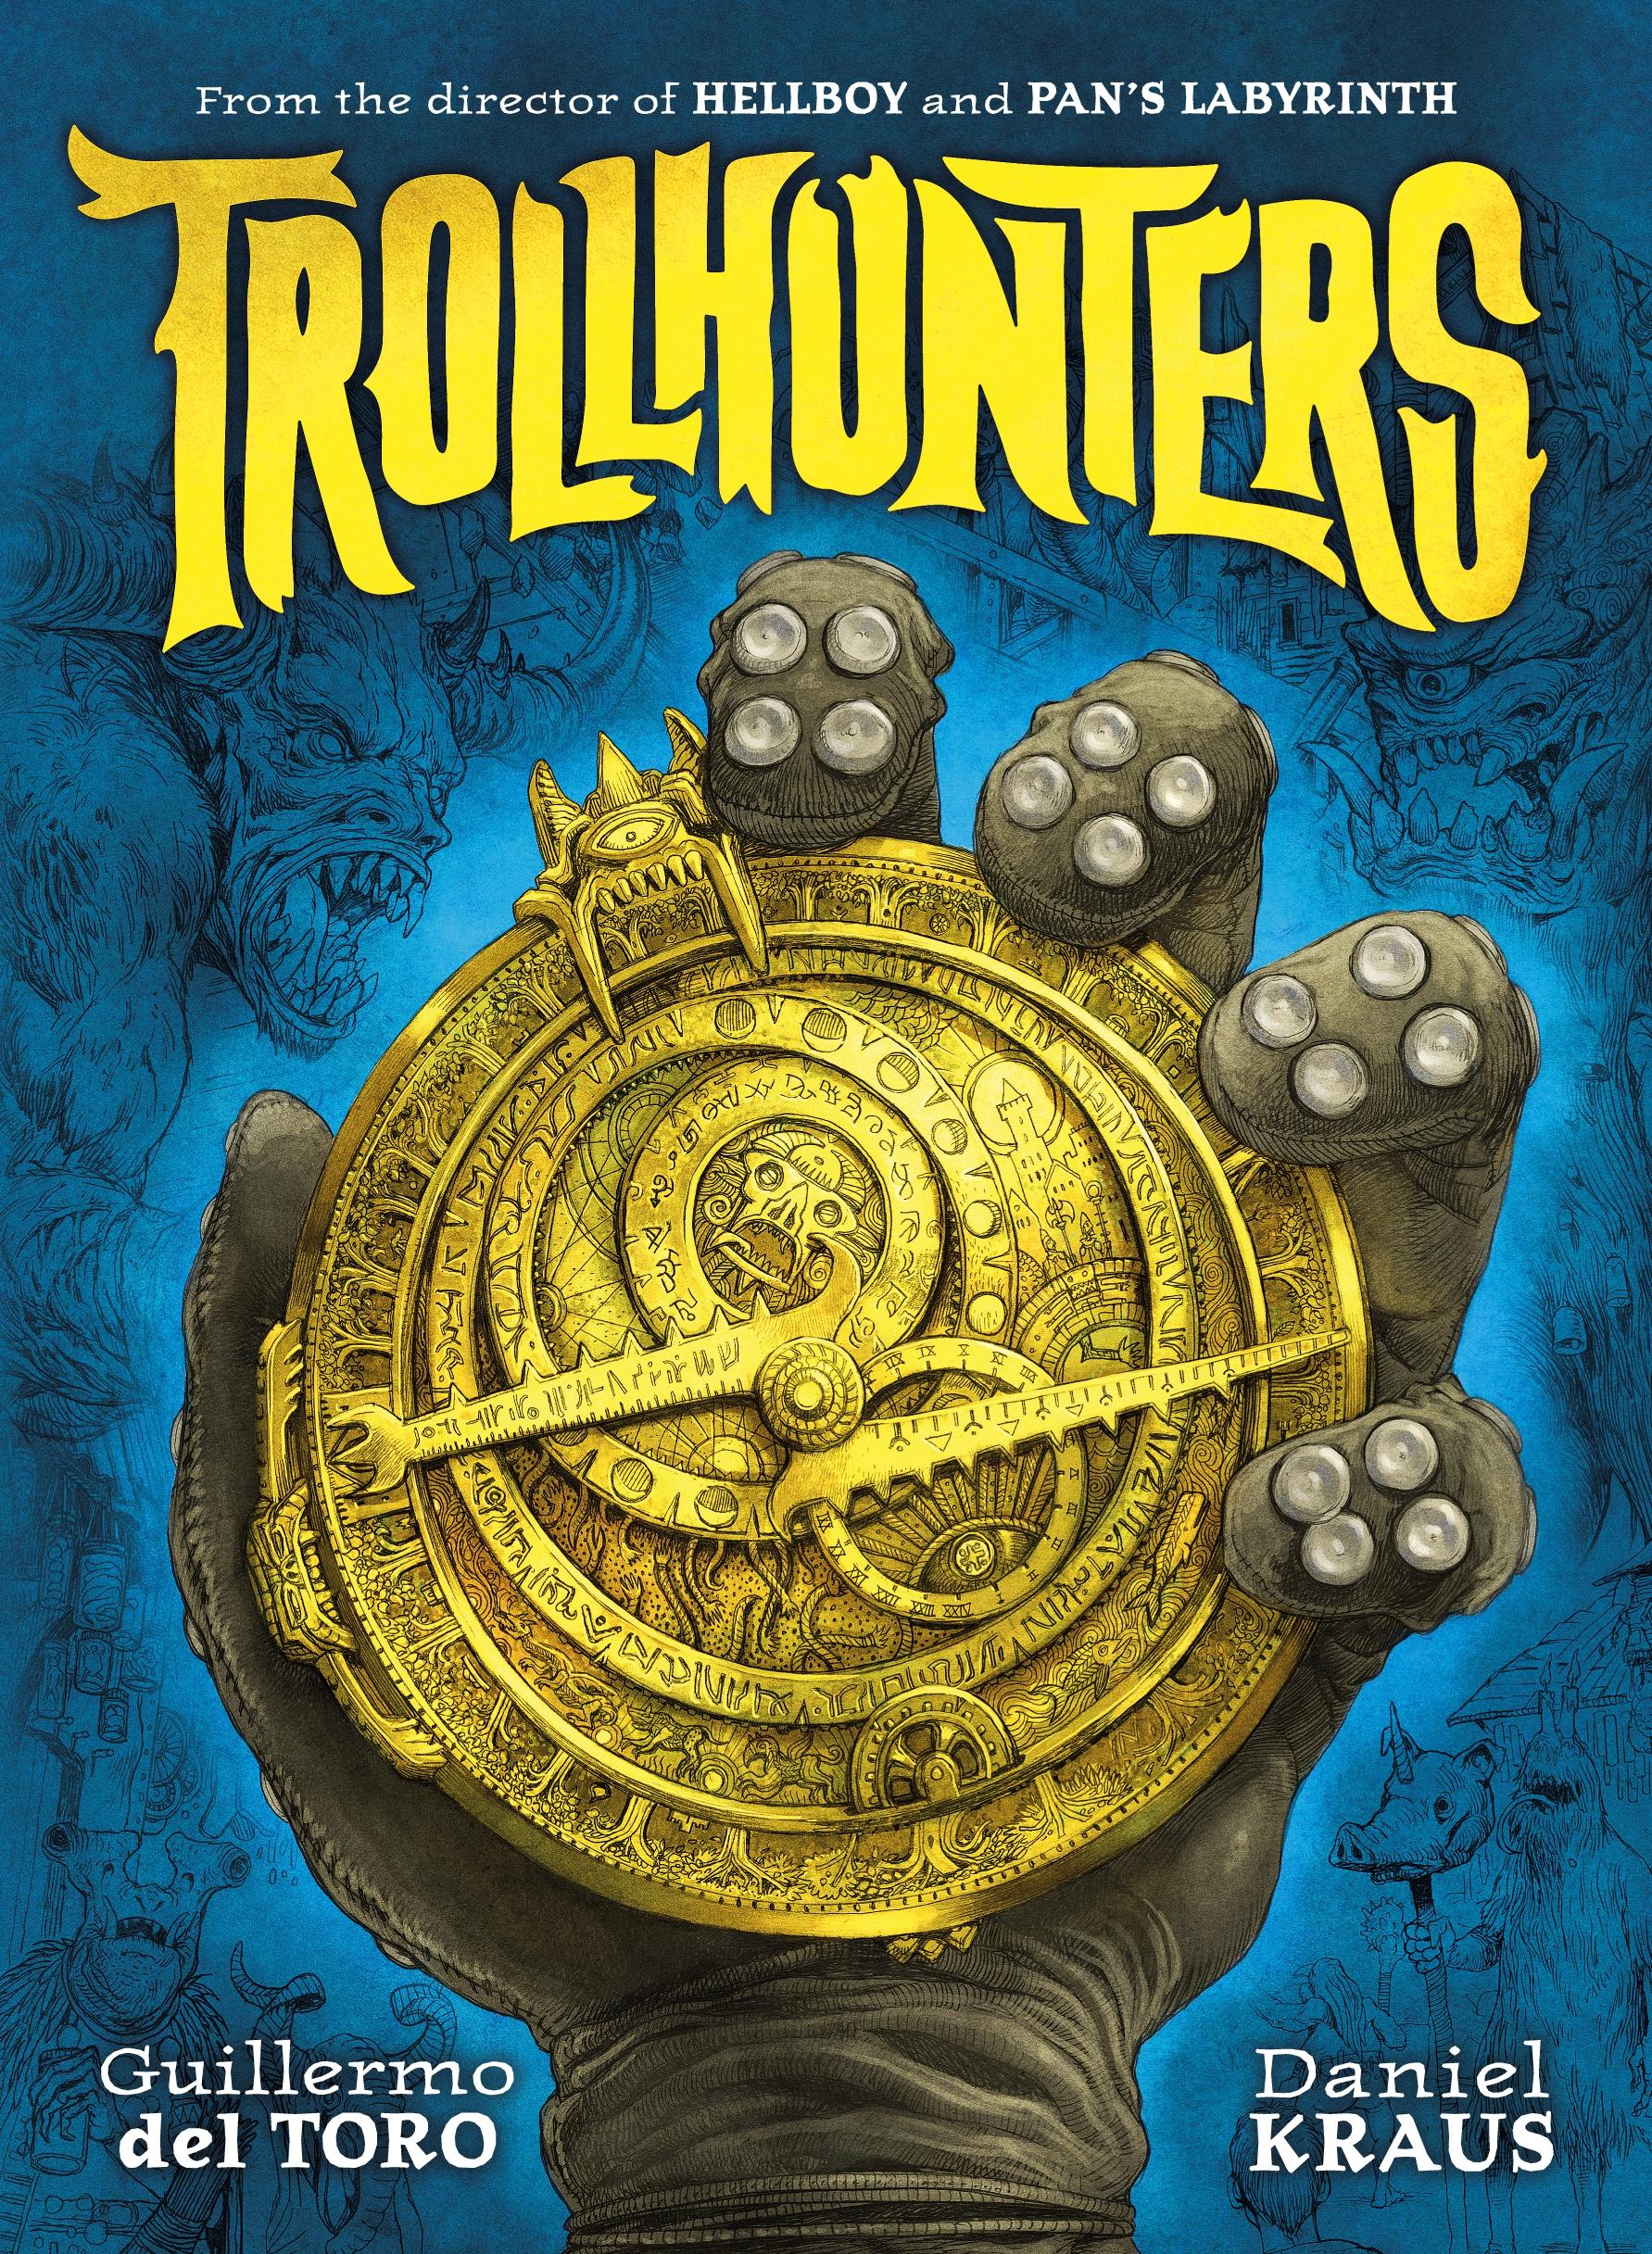 Trollhunters by Daniel KrausGuillermo Del Toro